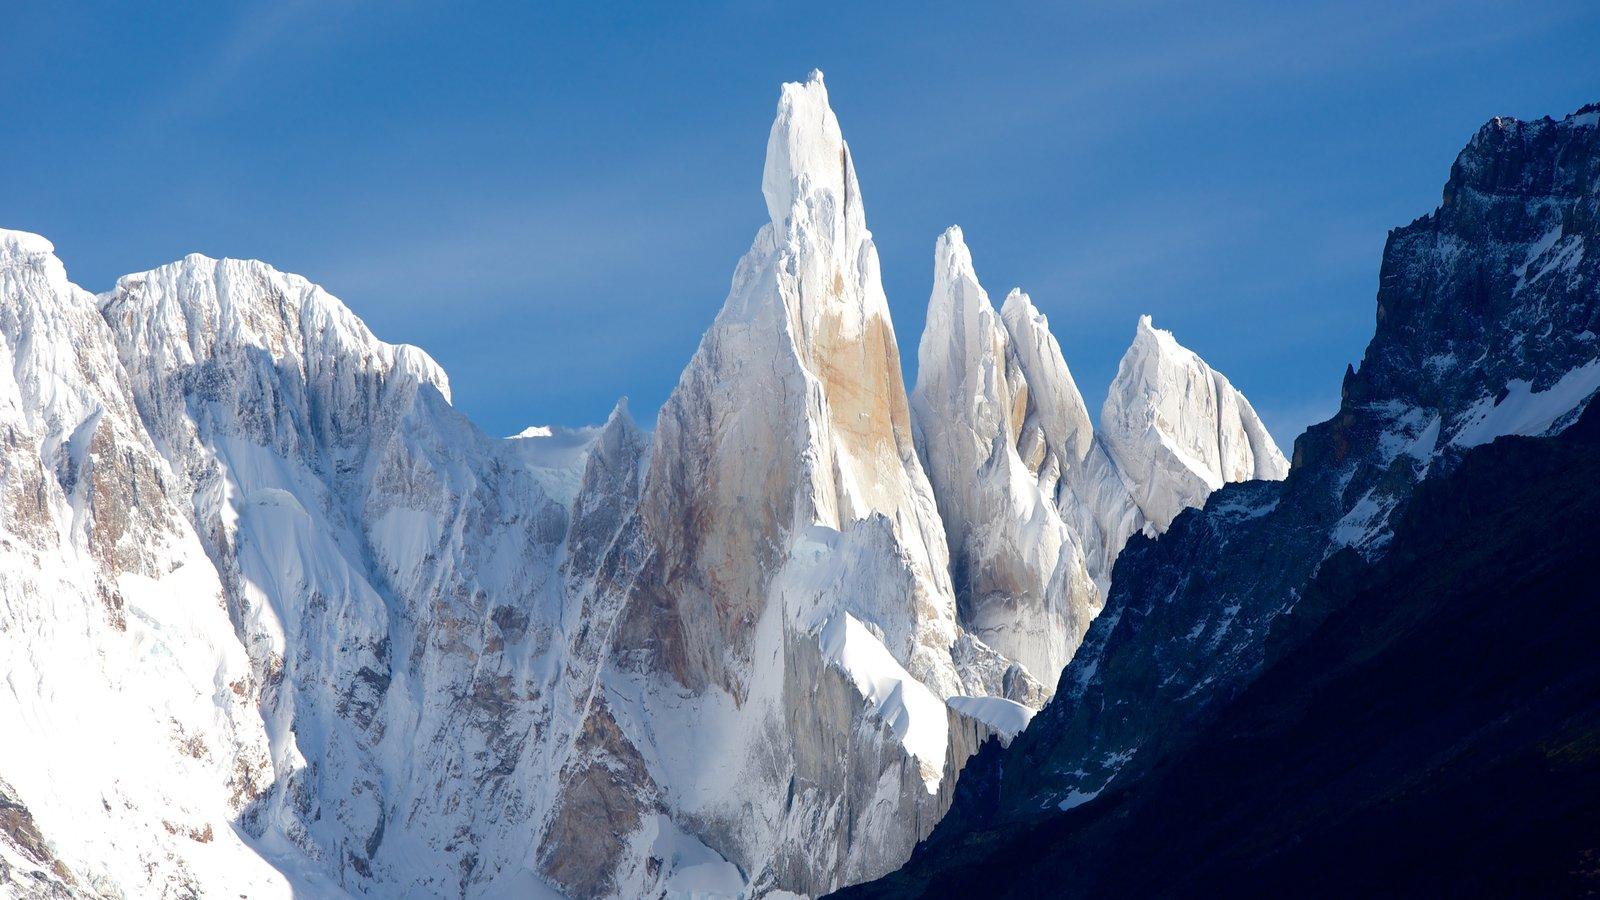 Parque Nacional Los Glaciares caracterizando neve e montanhas